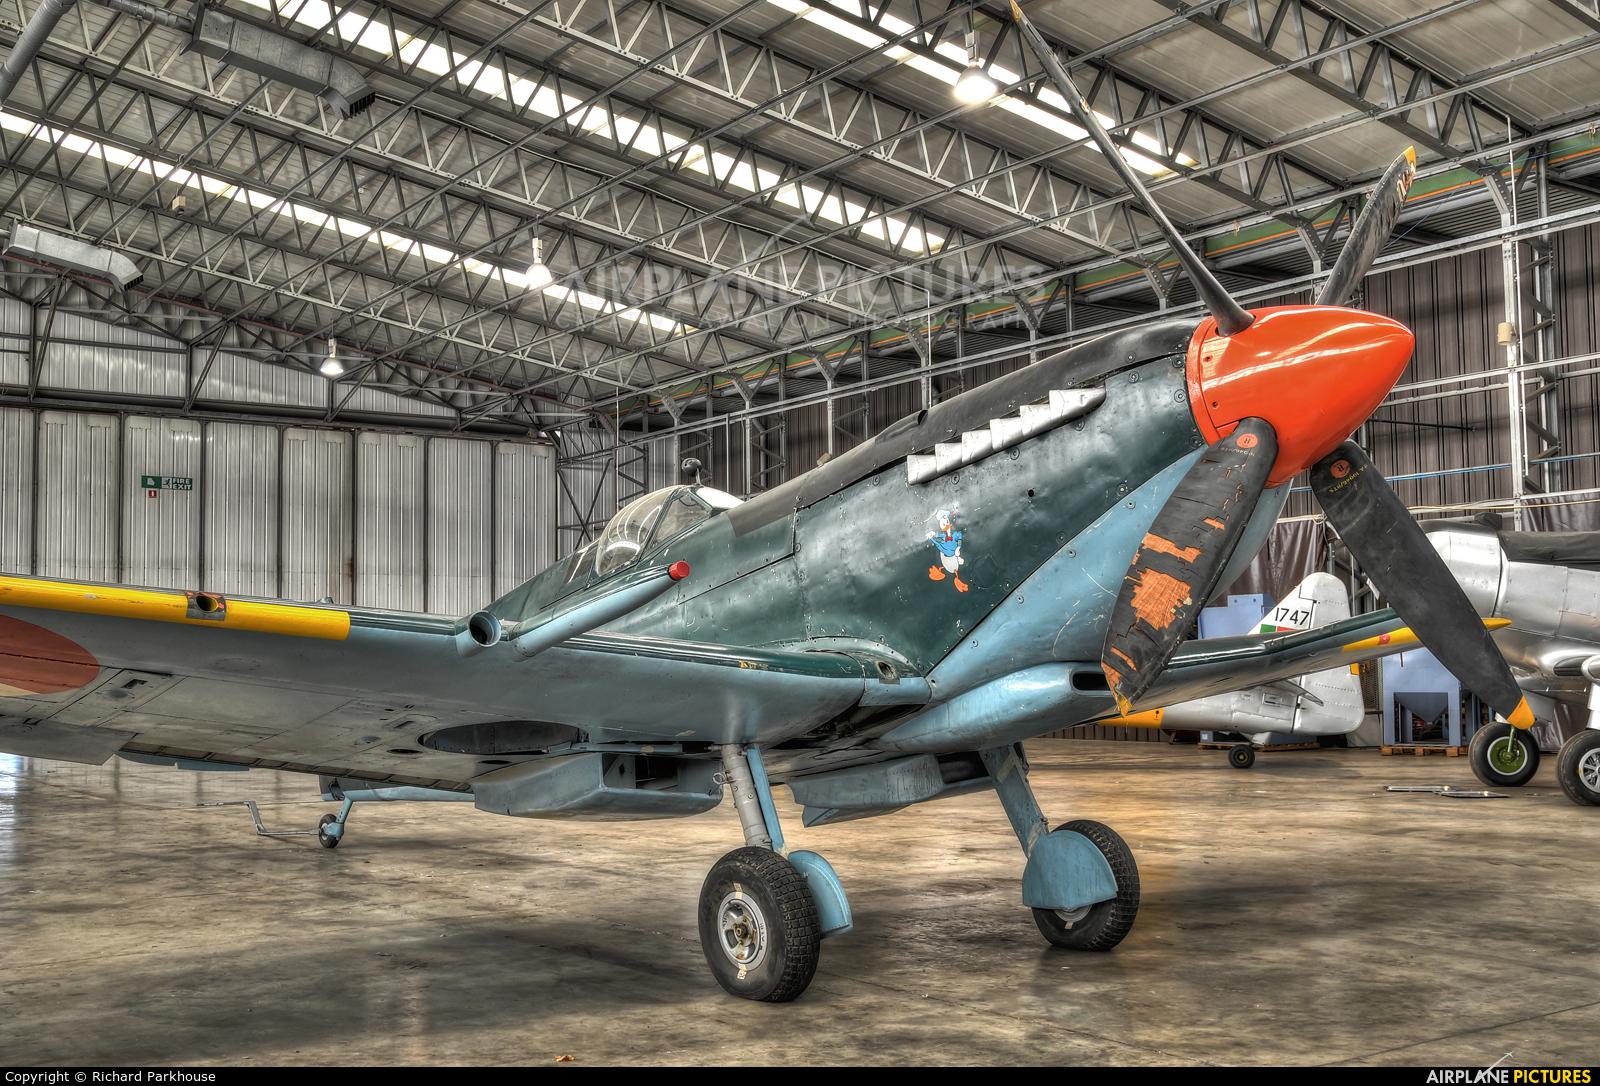 Historic Flying MJ271 aircraft at Duxford